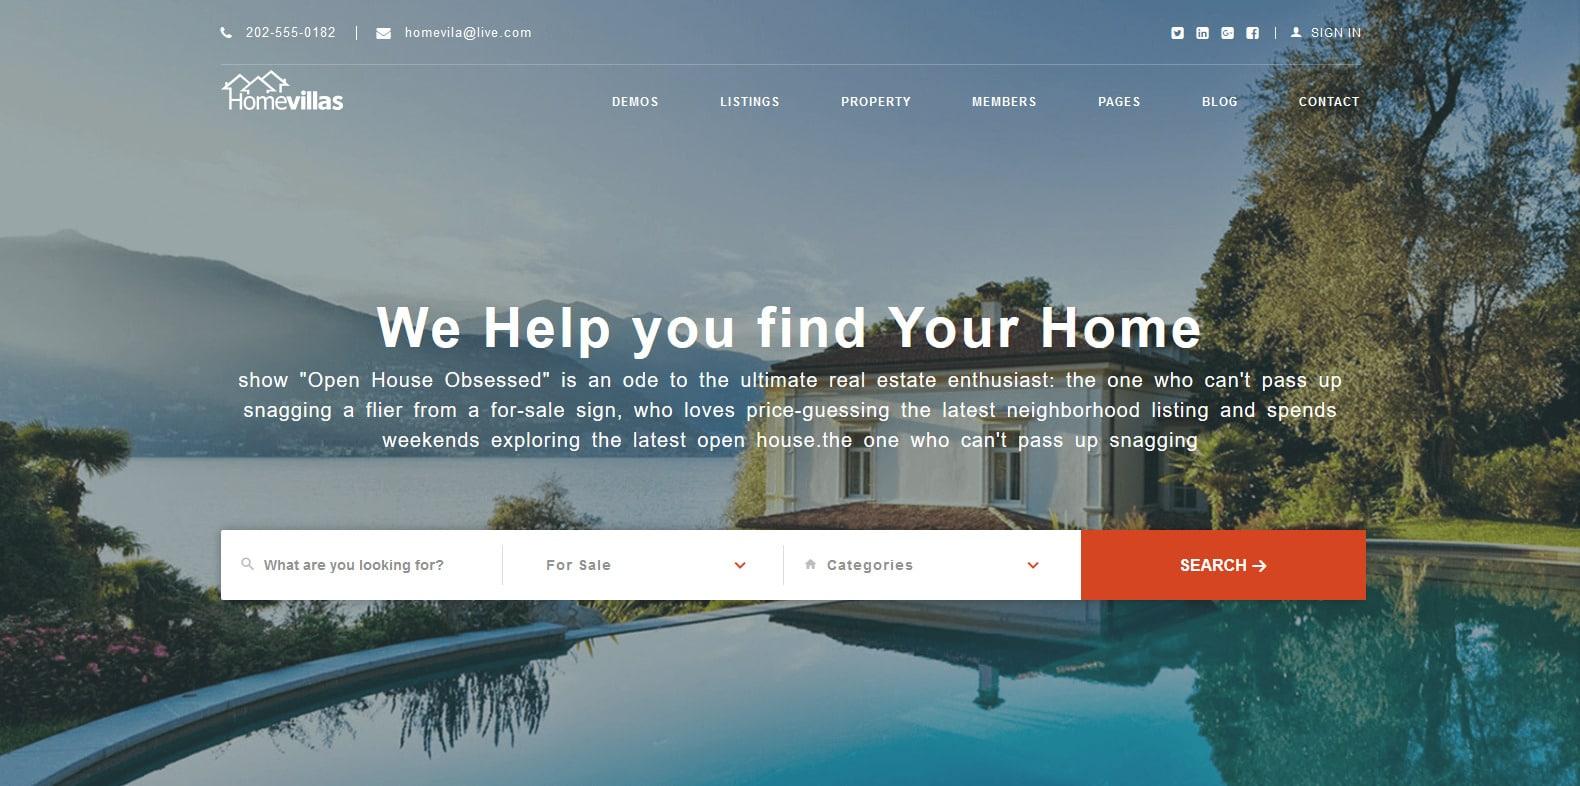 homevillas-property-management-websote-template